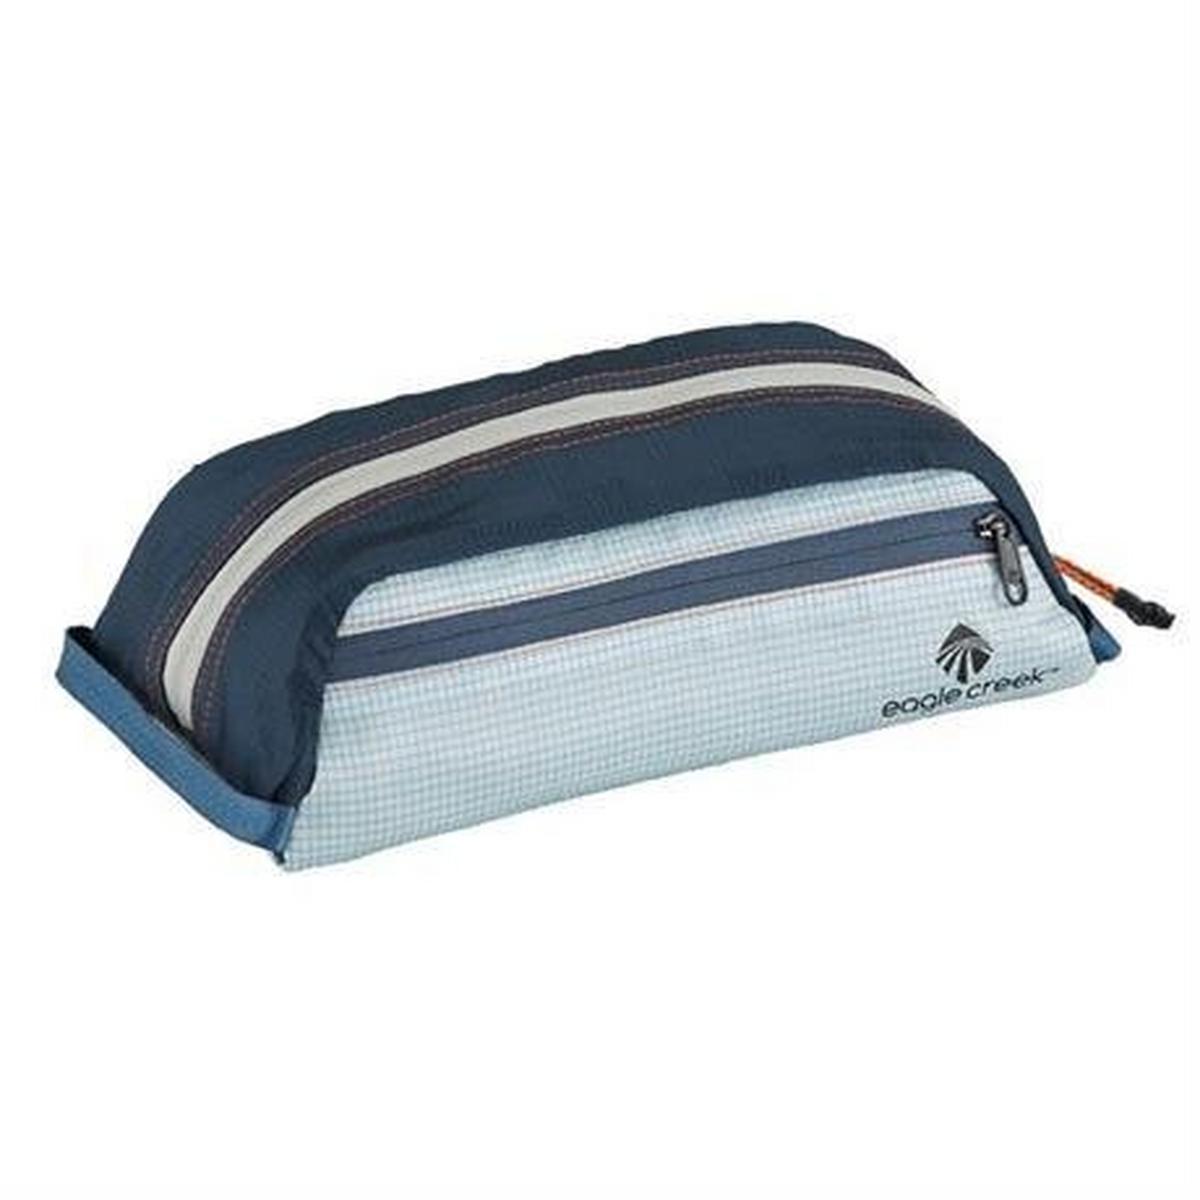 Eagle Creek Travel Luggage: Pack-It Specter Tech Quick Trip Indigo Blue